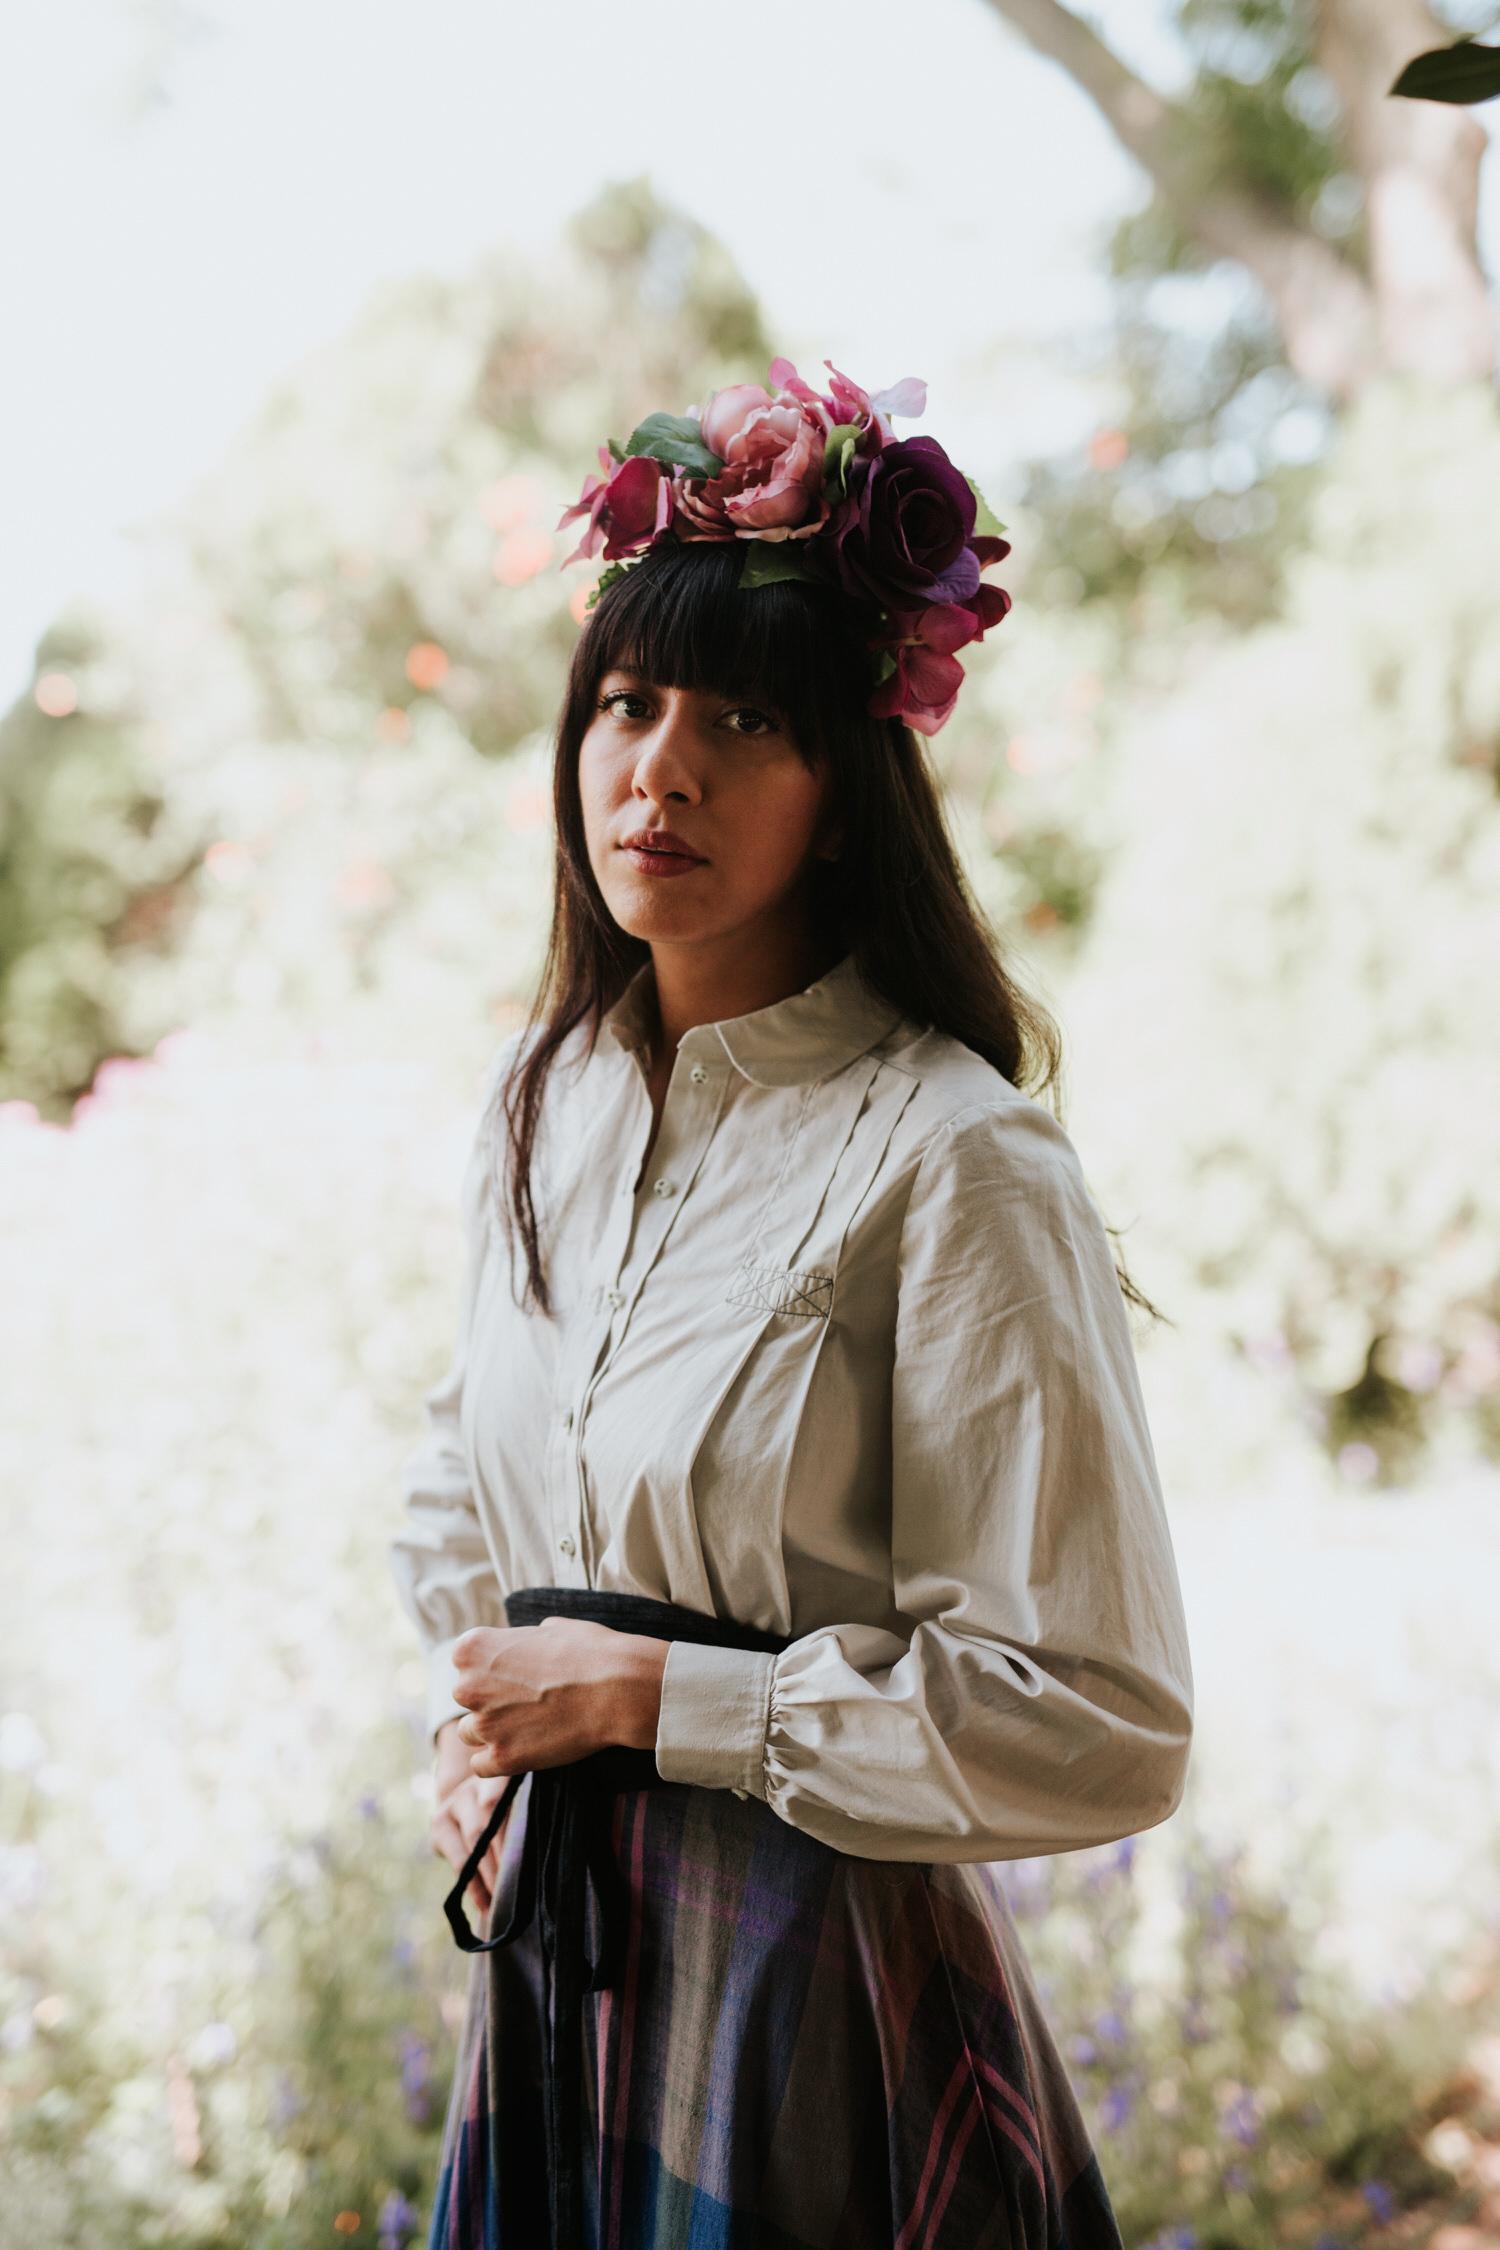 Model in vintage with flower crown